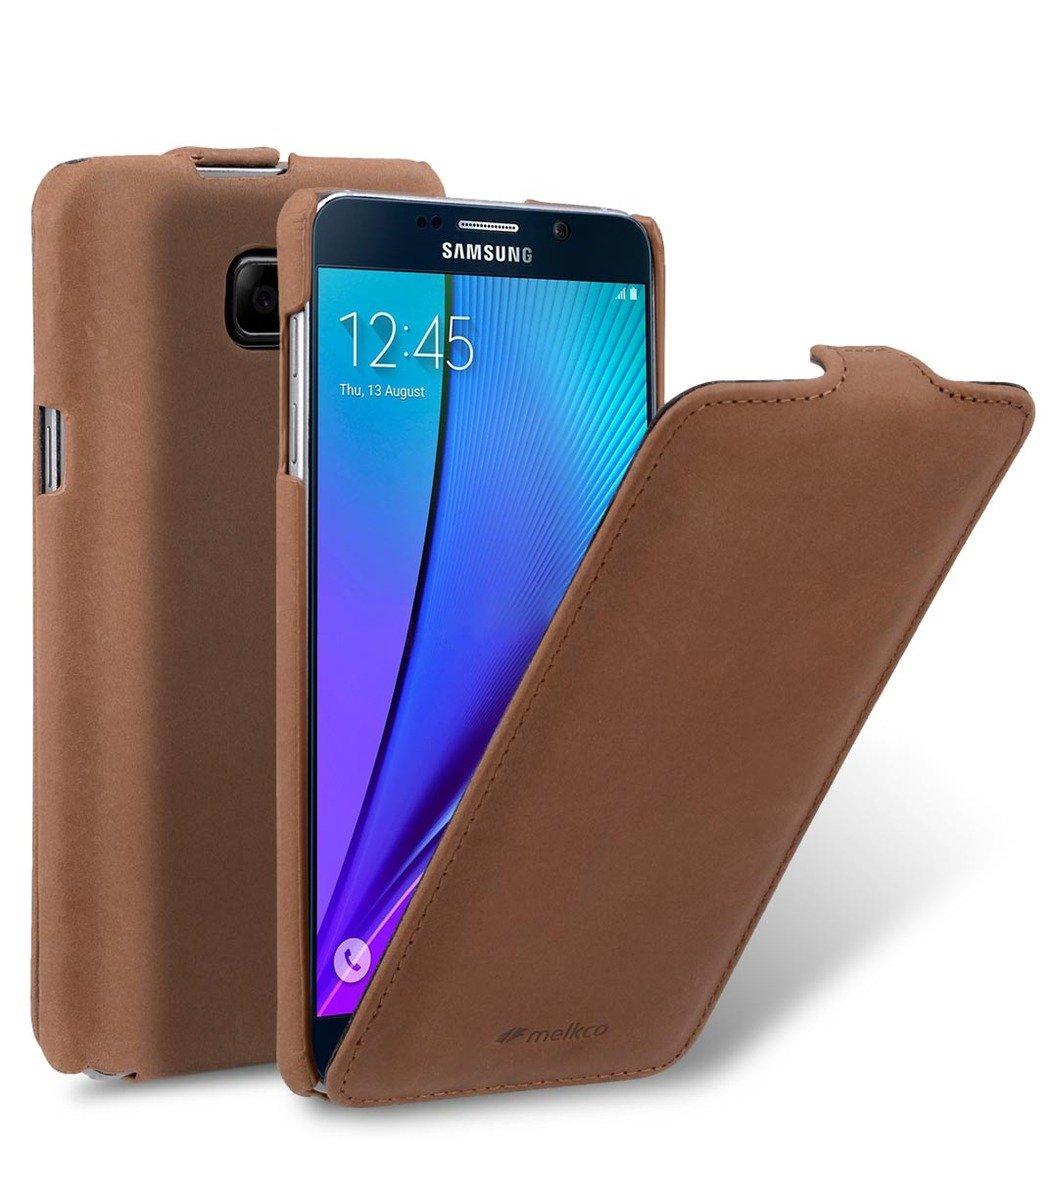 Samsung Galaxy Note 5 Jacka Type 高級真皮革手機套 - 磨沙啡色